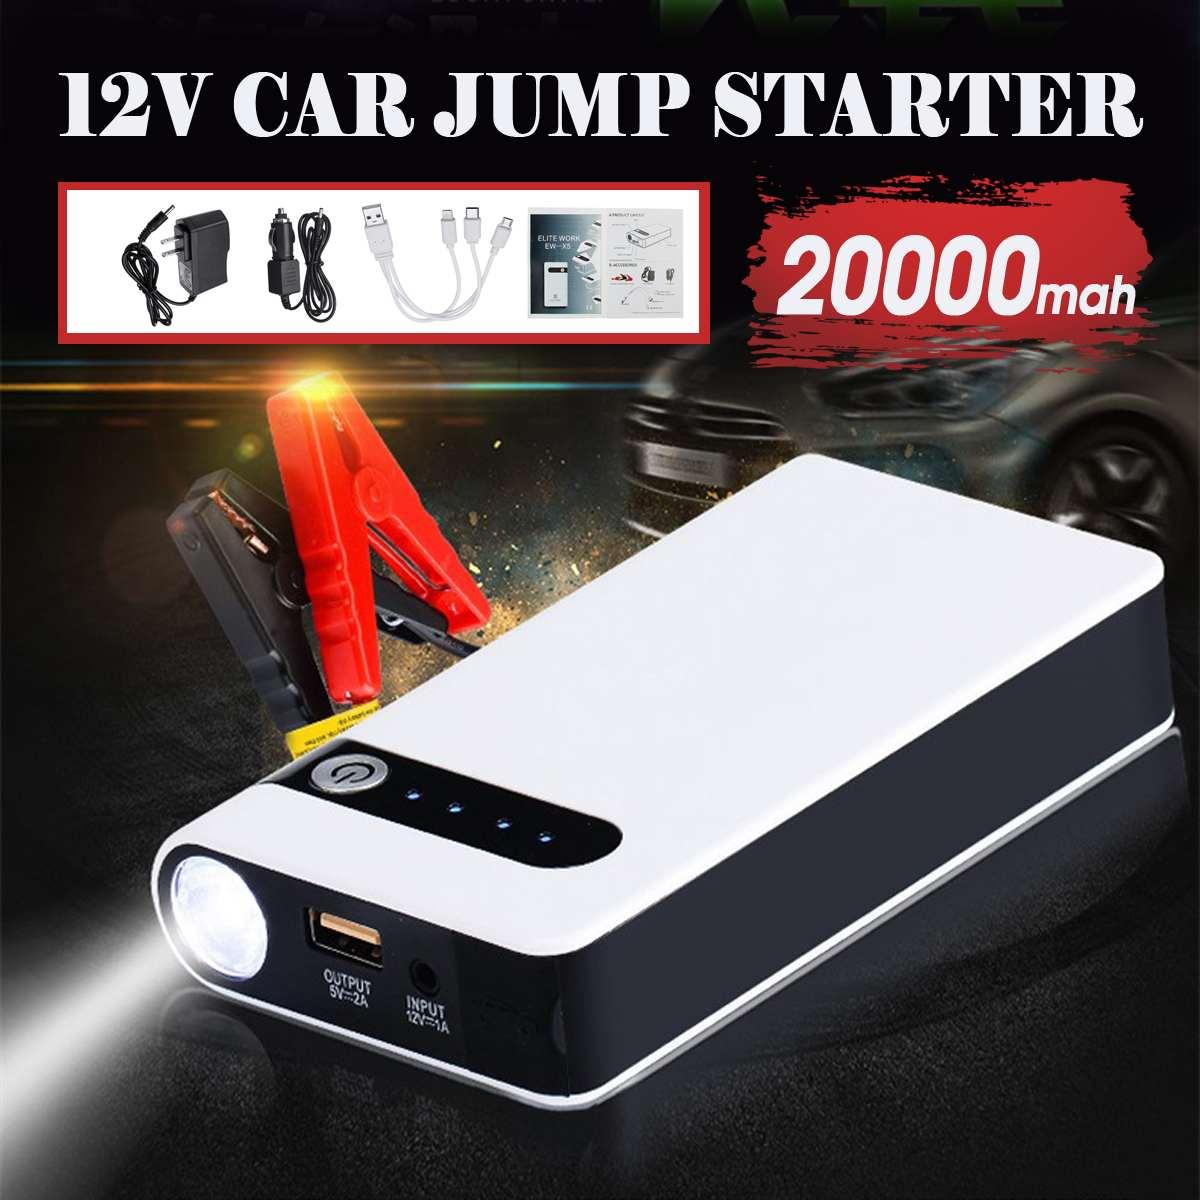 12V 20000mAh Car Jump Starter Booster USB Jumper Box Power Bank Battery Charger Emergency Starting Device